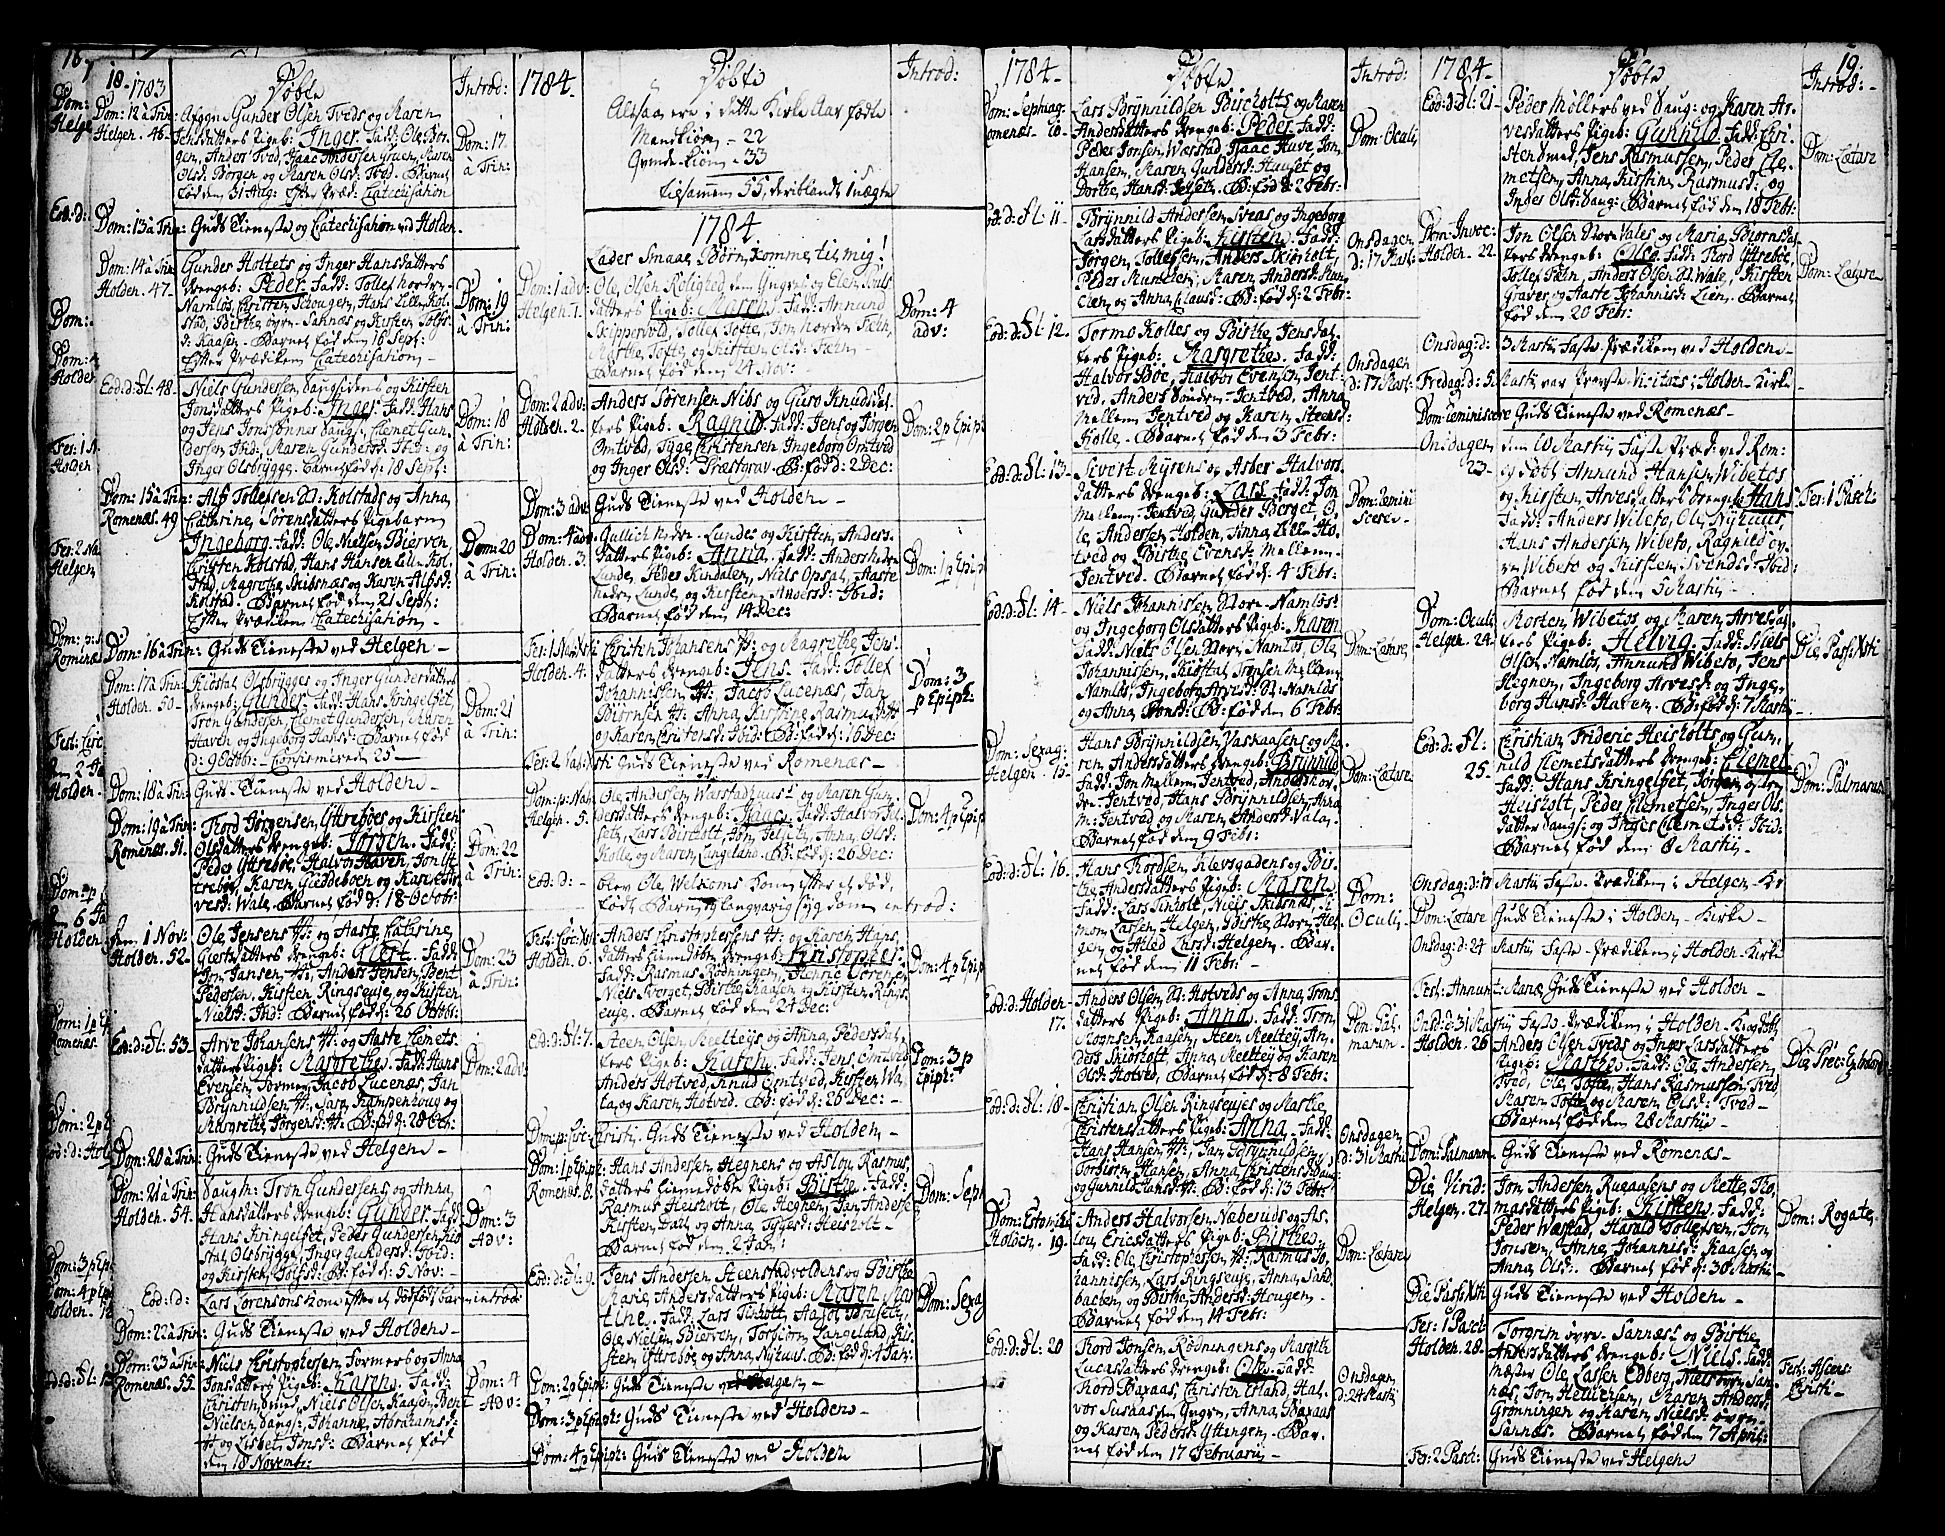 SAKO, Holla kirkebøker, F/Fa/L0002: Ministerialbok nr. 2, 1779-1814, s. 18-19